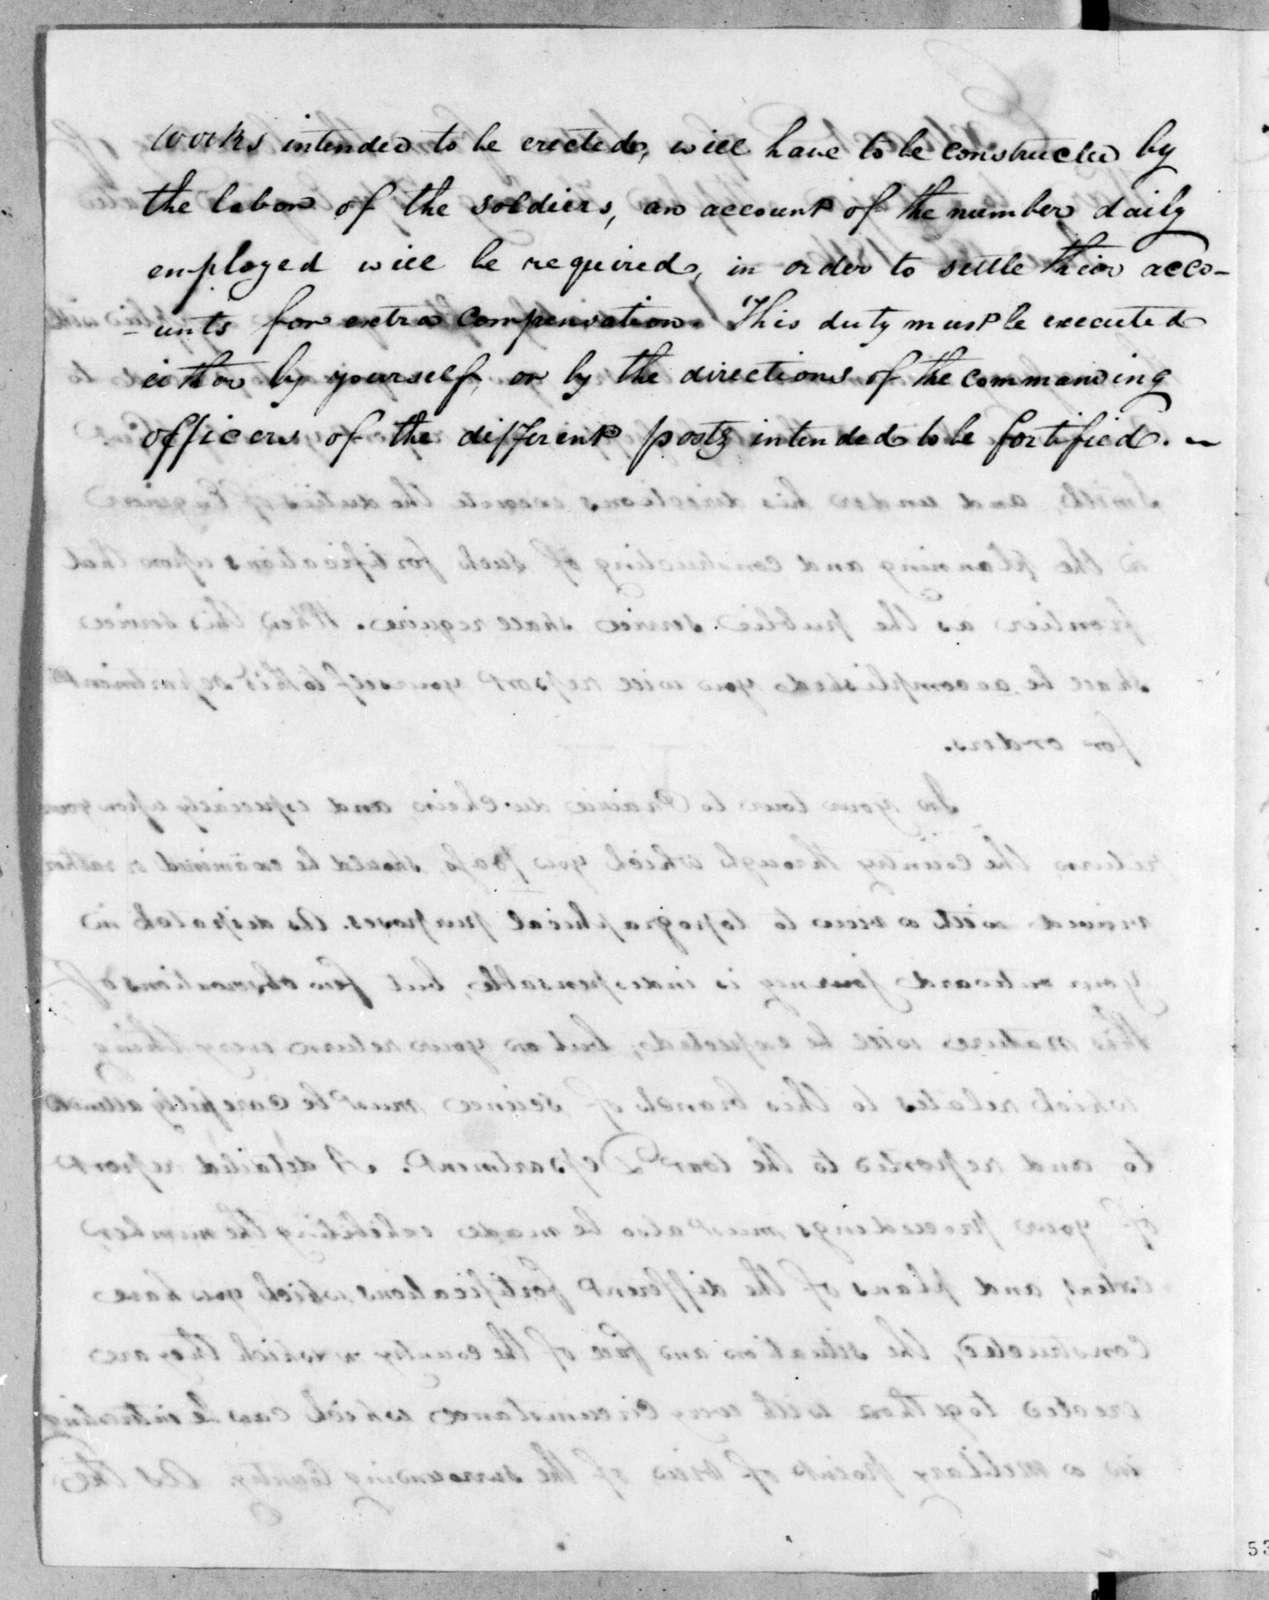 William Harris Crawford to Stephen Harriman Long, June 18, 1816